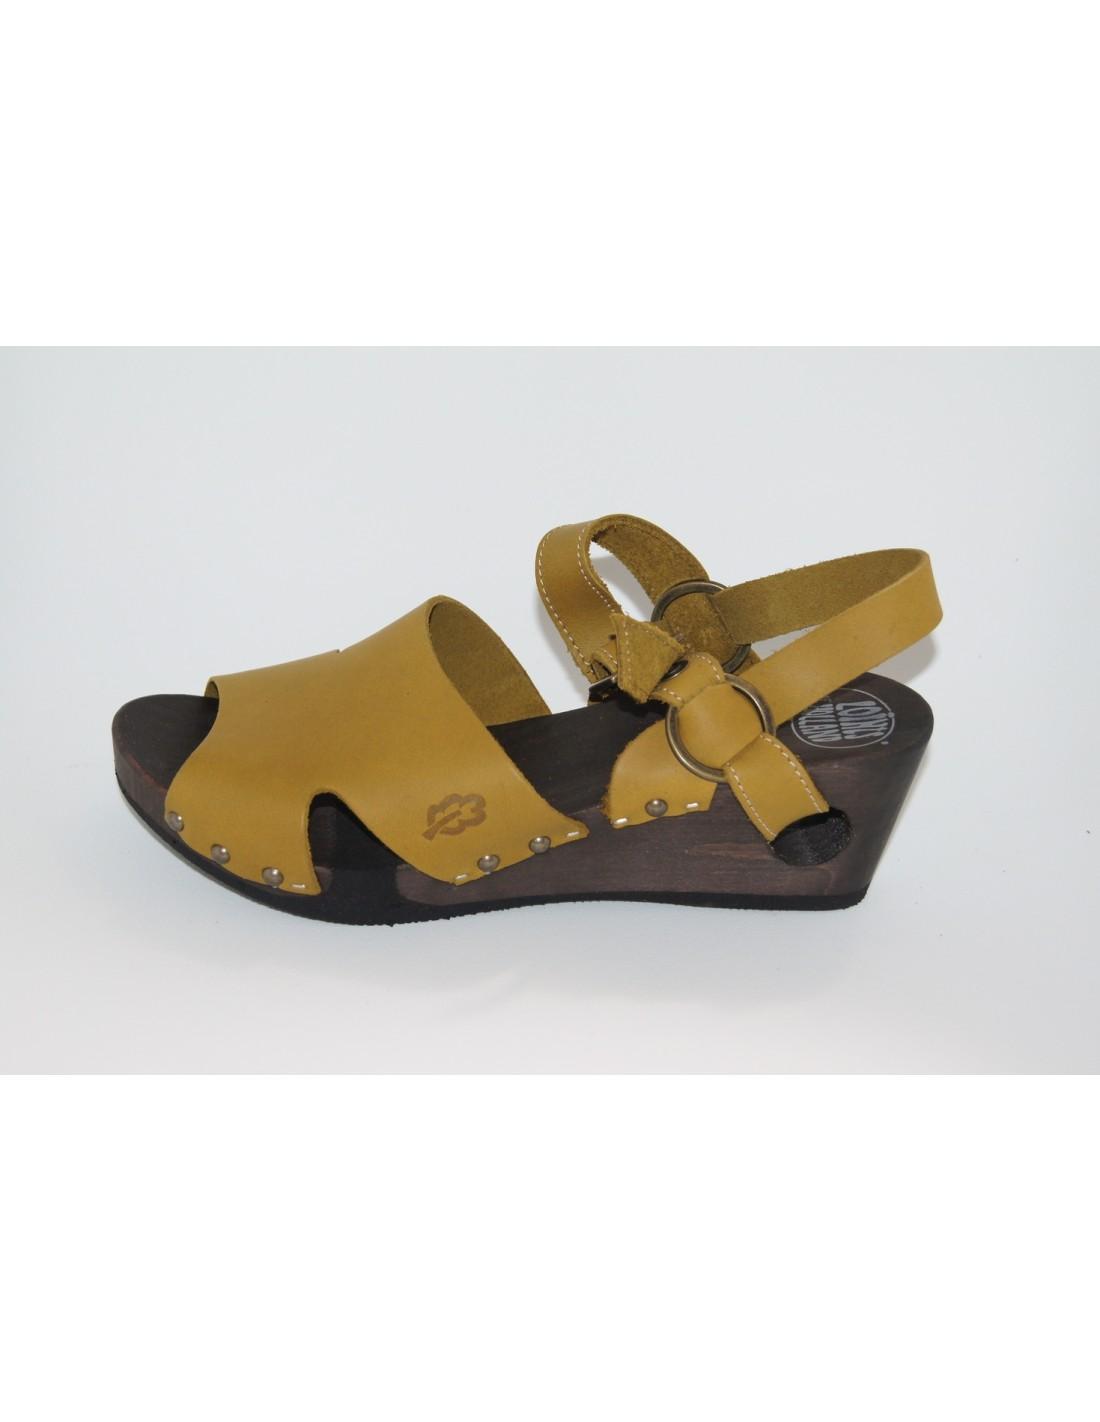 e4d62302e7b sandalia cuña de madera WOODSTOCK de LOINTS   mostaza. Loading zoom